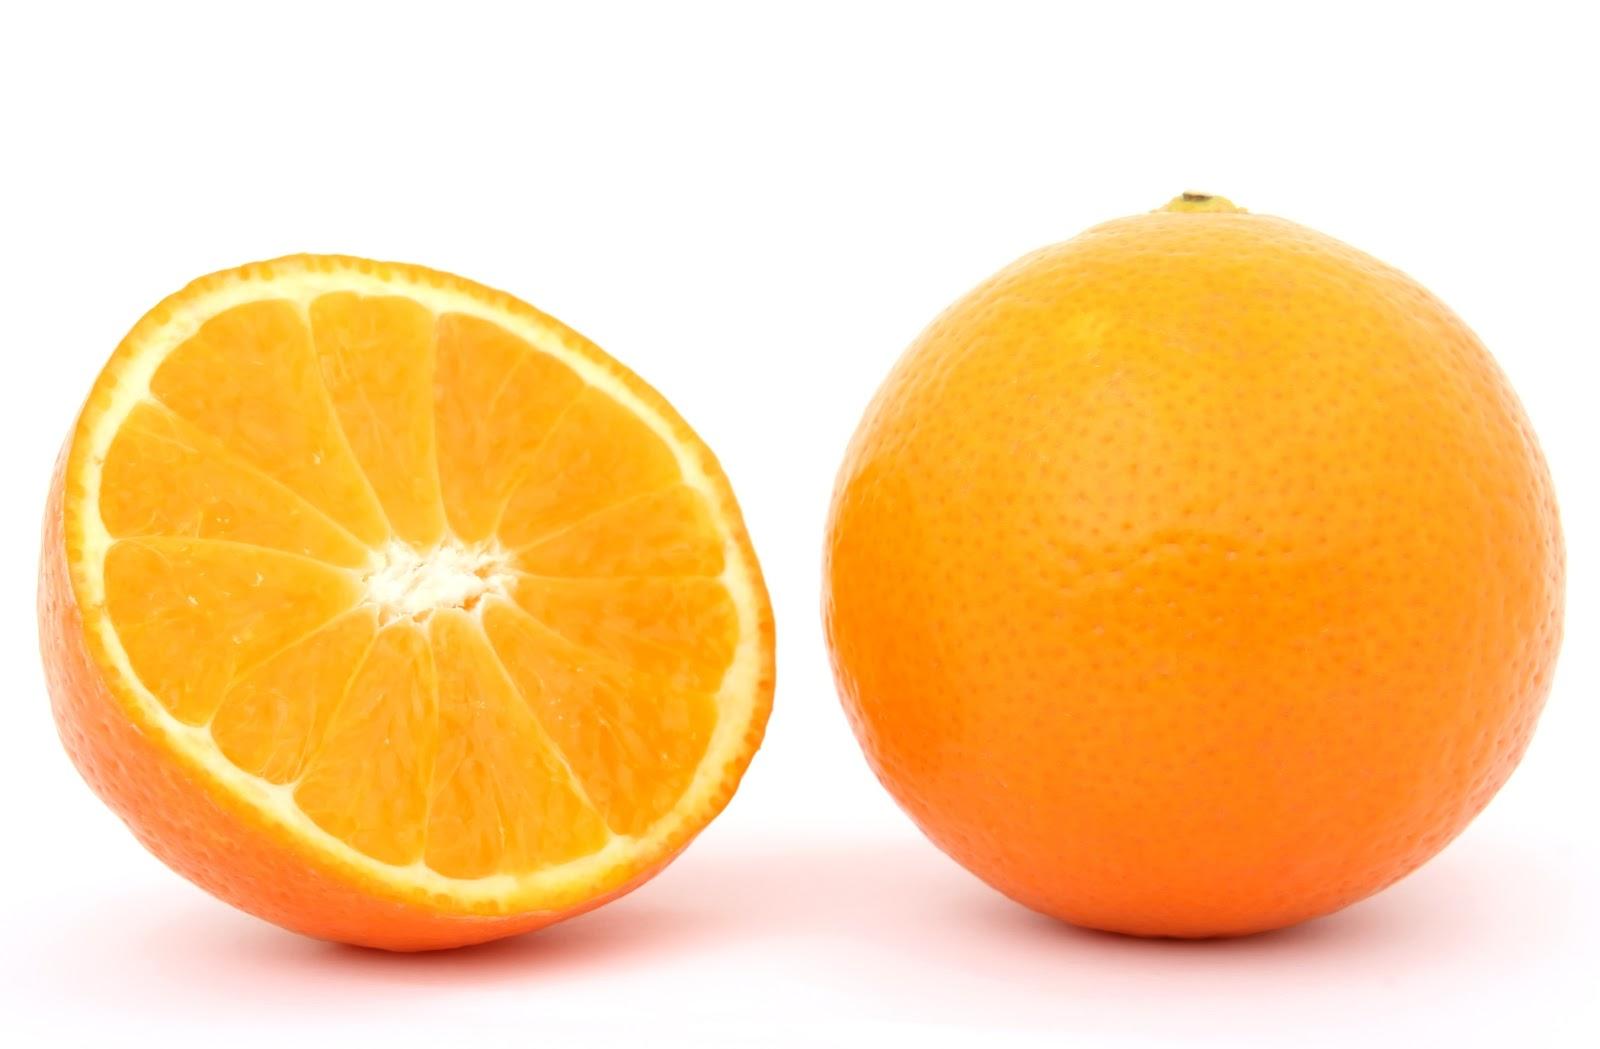 Oranges are good for eyesight